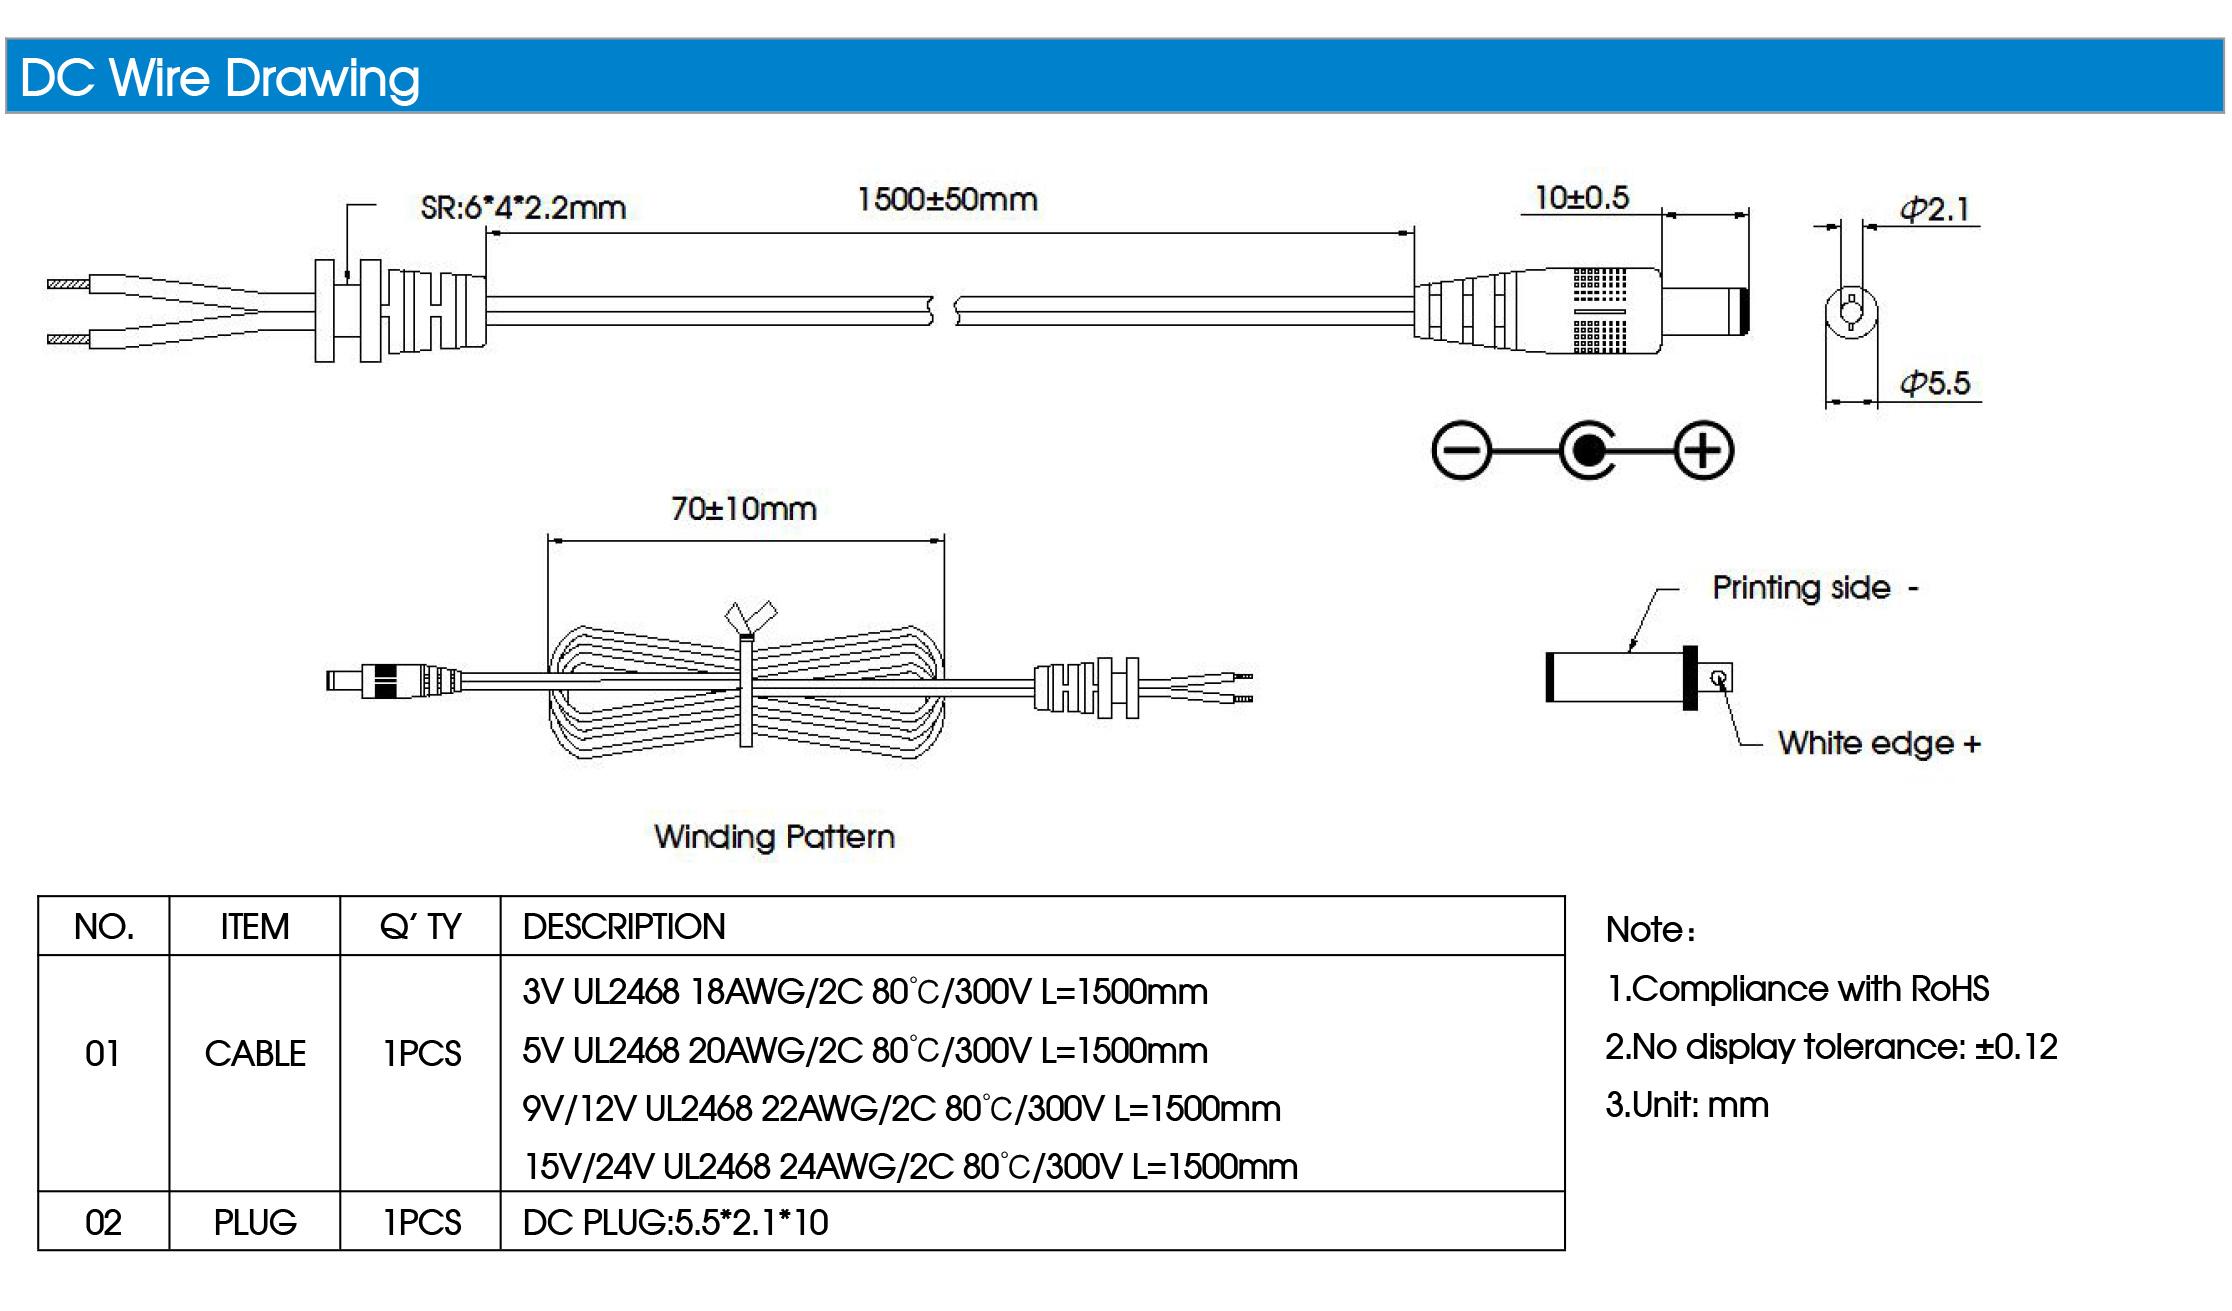 12w 3v 5v 9v 12v 15v 24v Wall Mounted Type Ac Dc Power Adapter